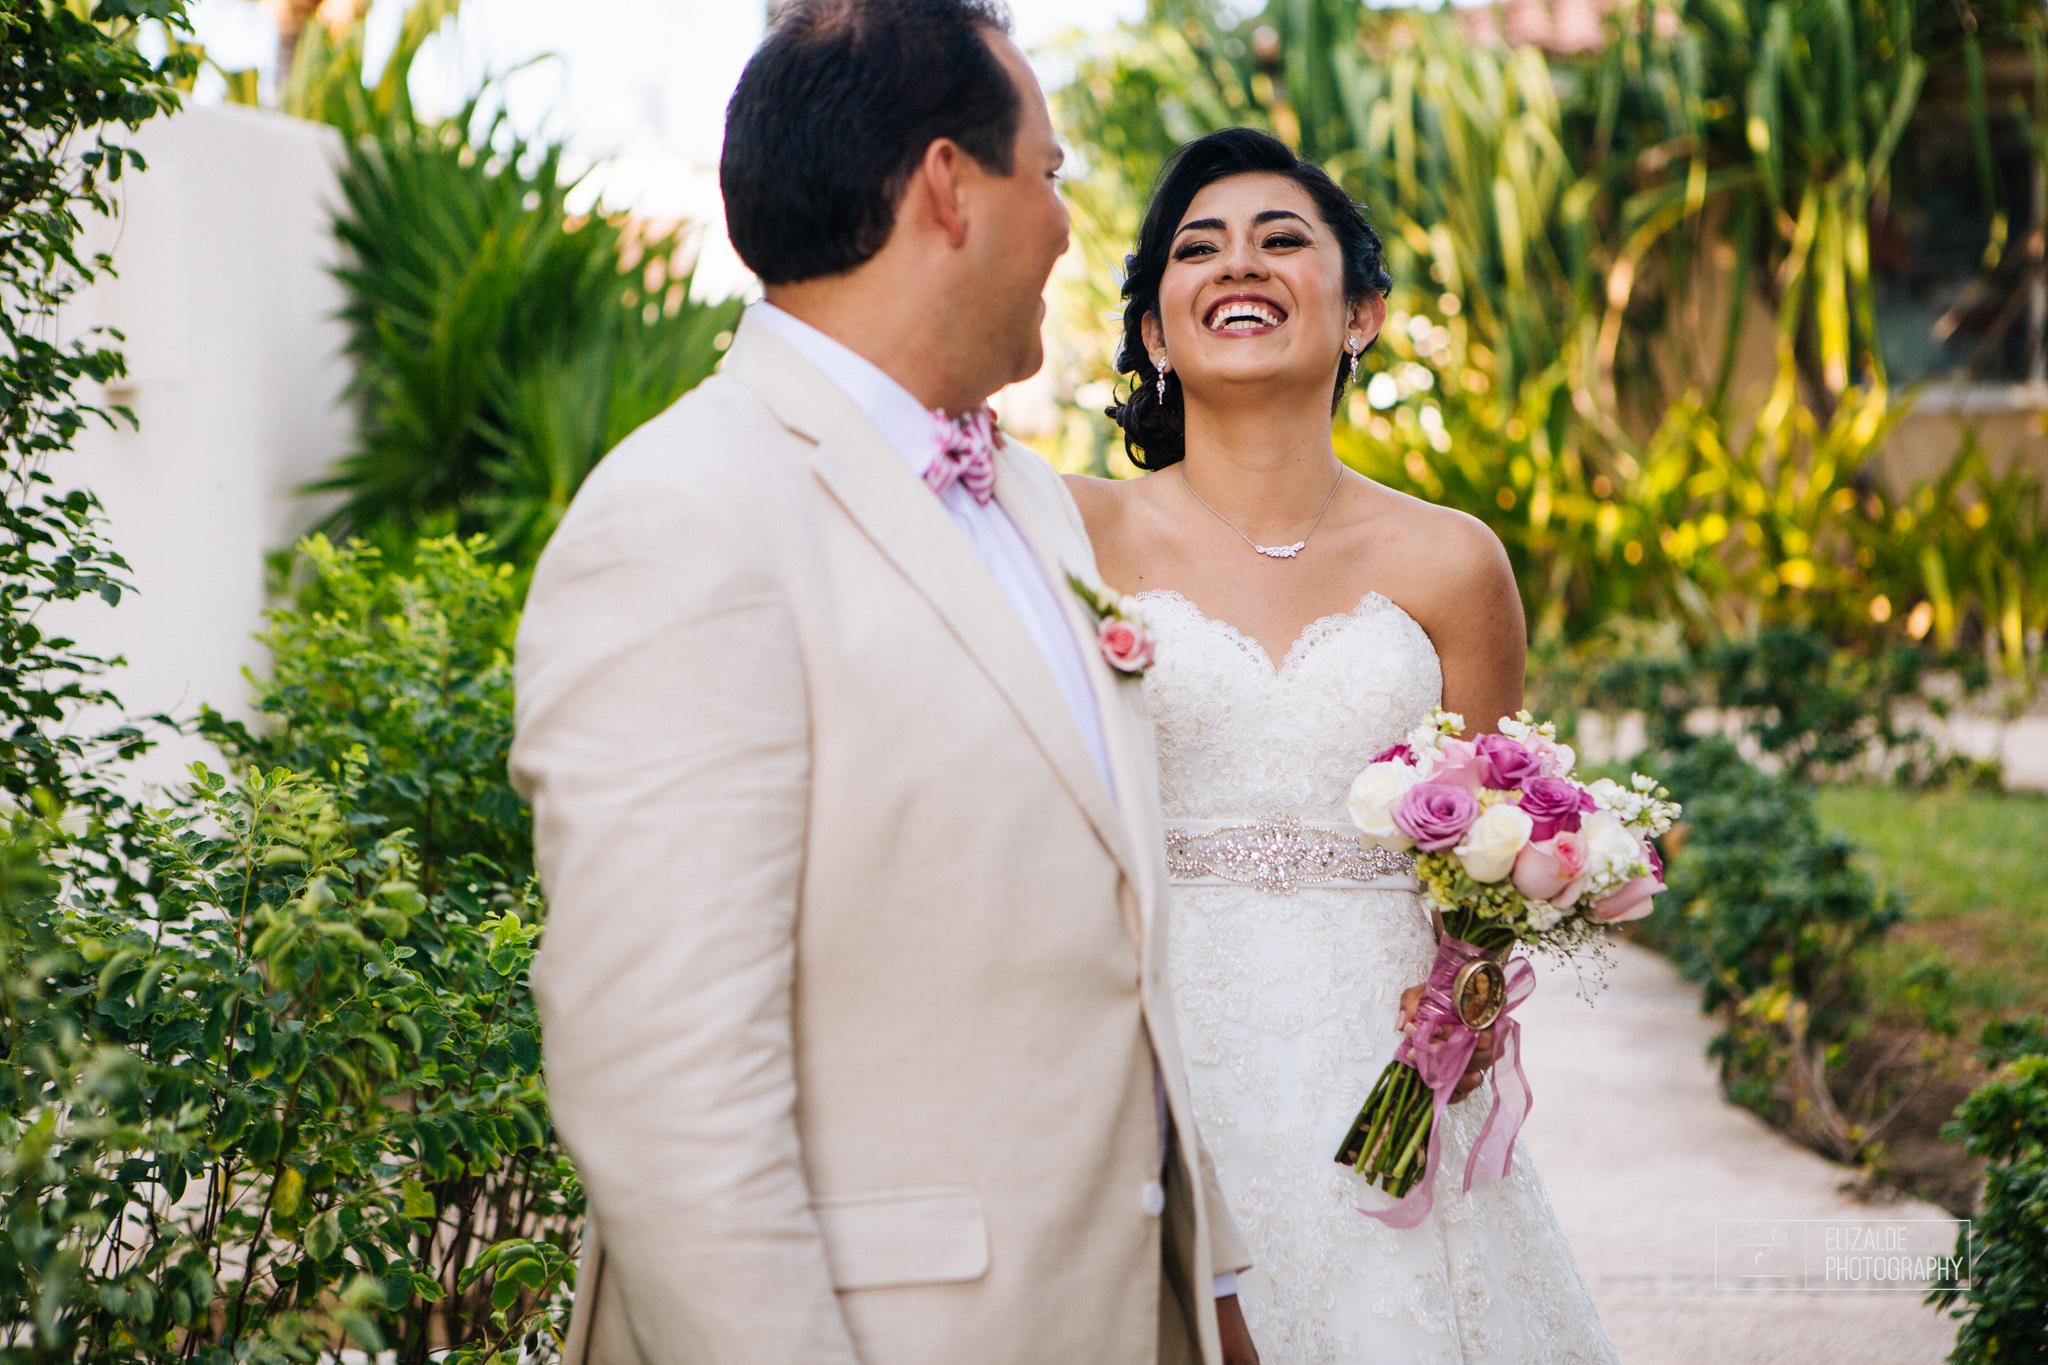 Pay and Ferran_Acapulco_Destination Wedding_Elizalde Photography-60.jpg